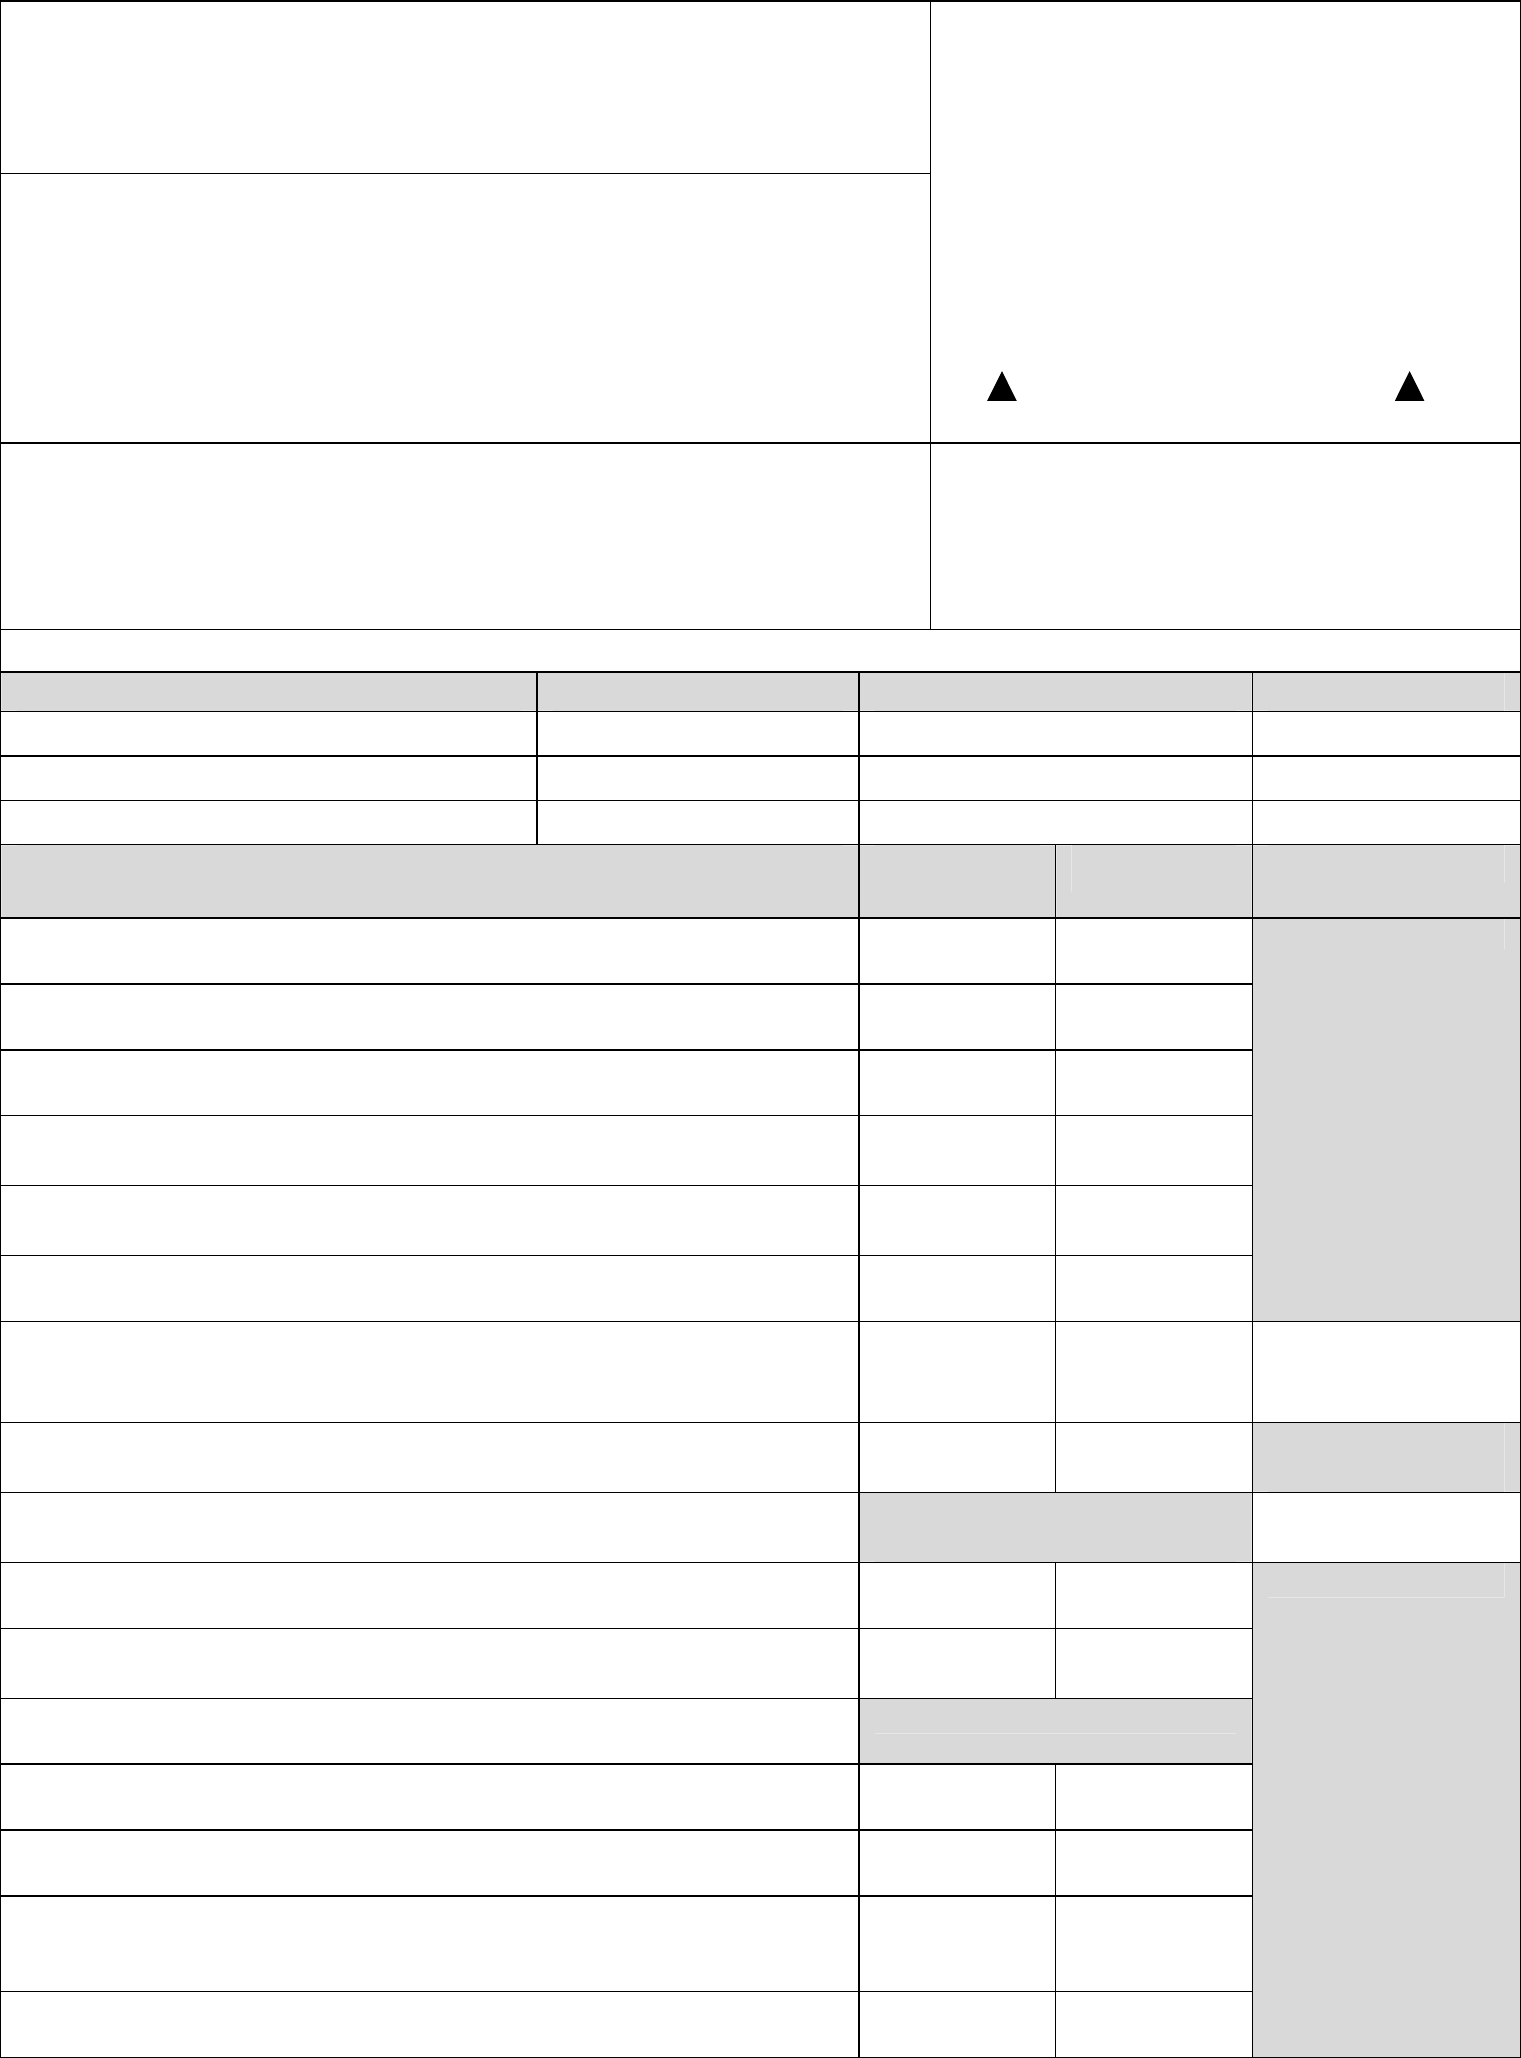 Sole Custody Worksheet